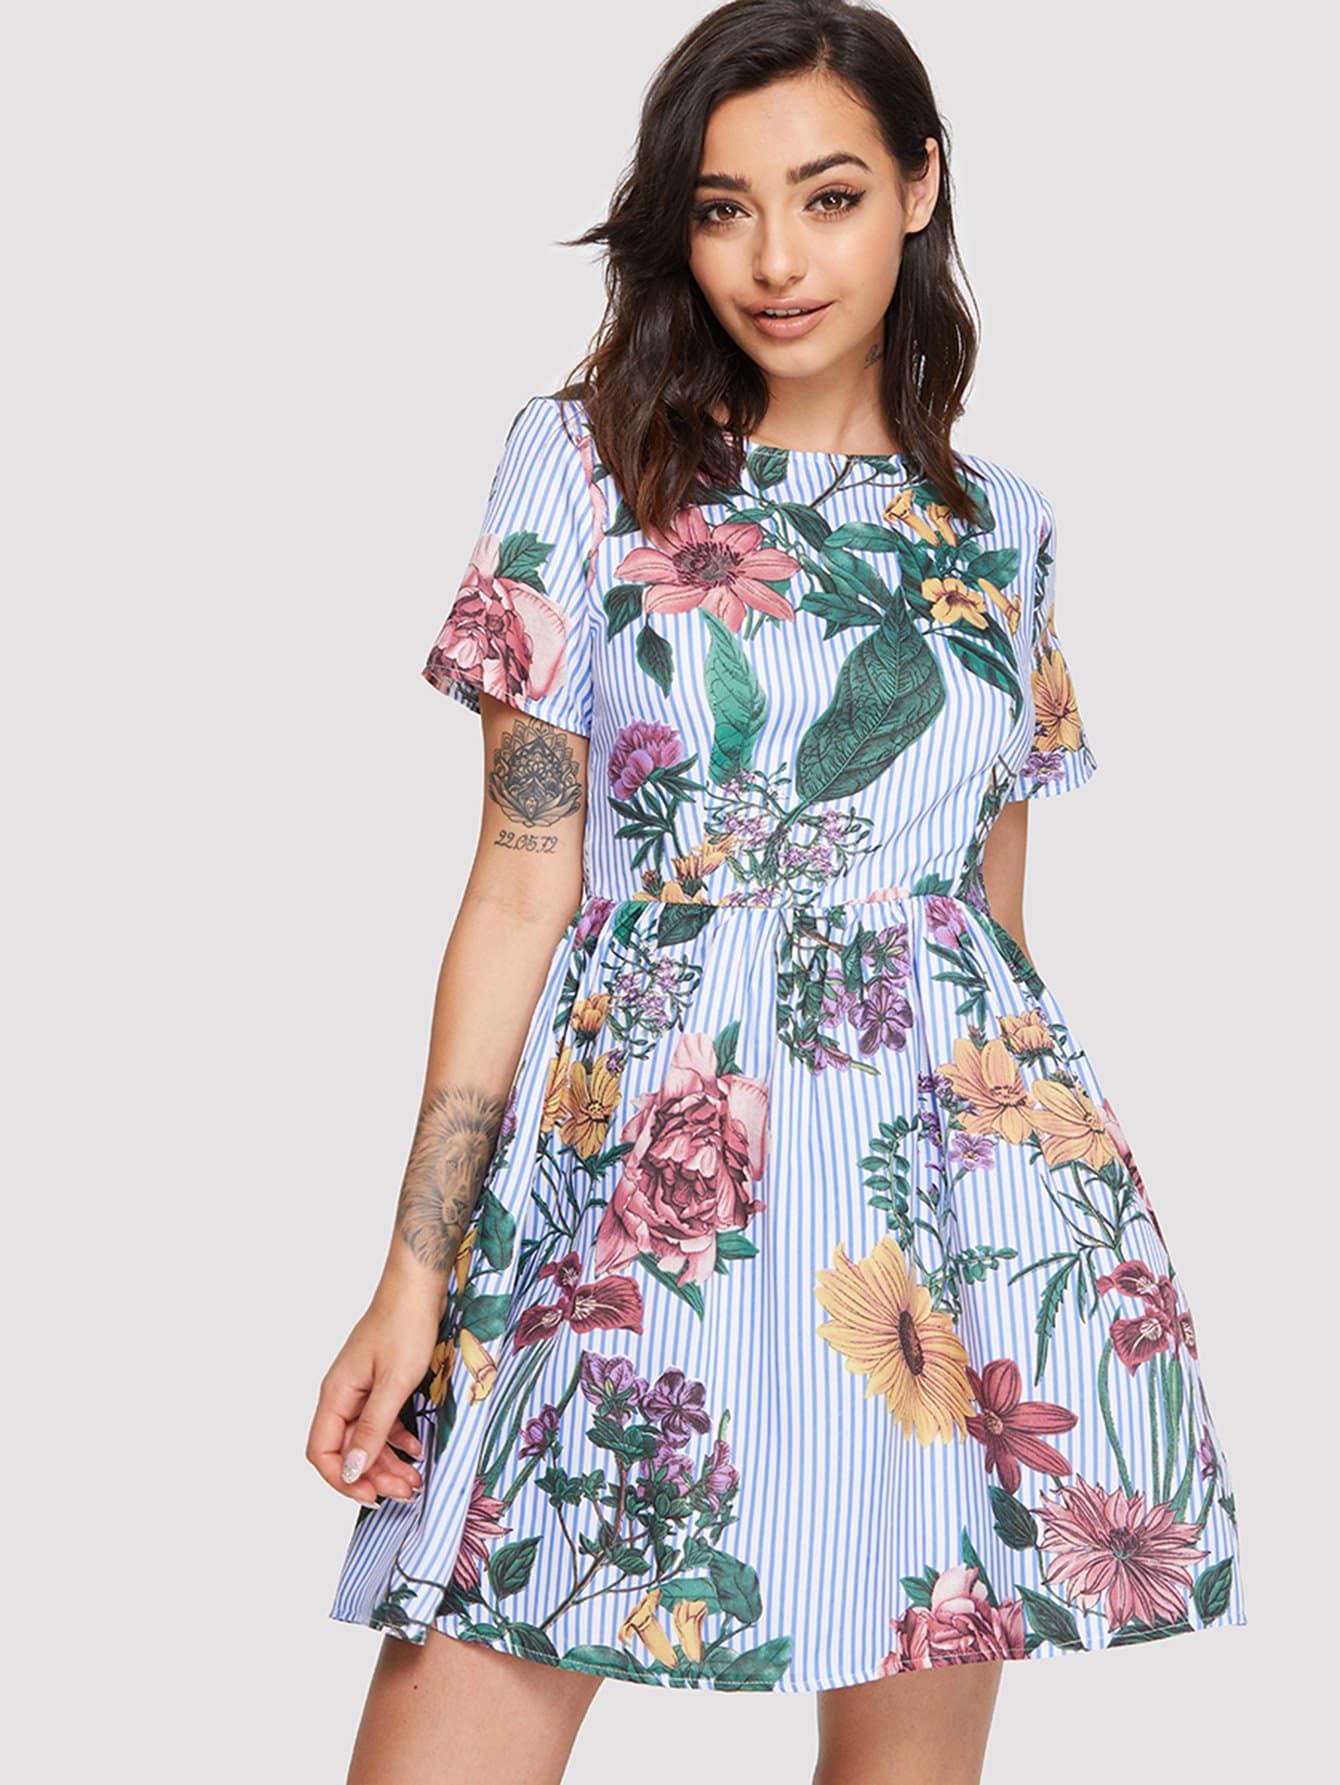 Flower and Stripe Print Smock Dress letter and stripe print glitter dress